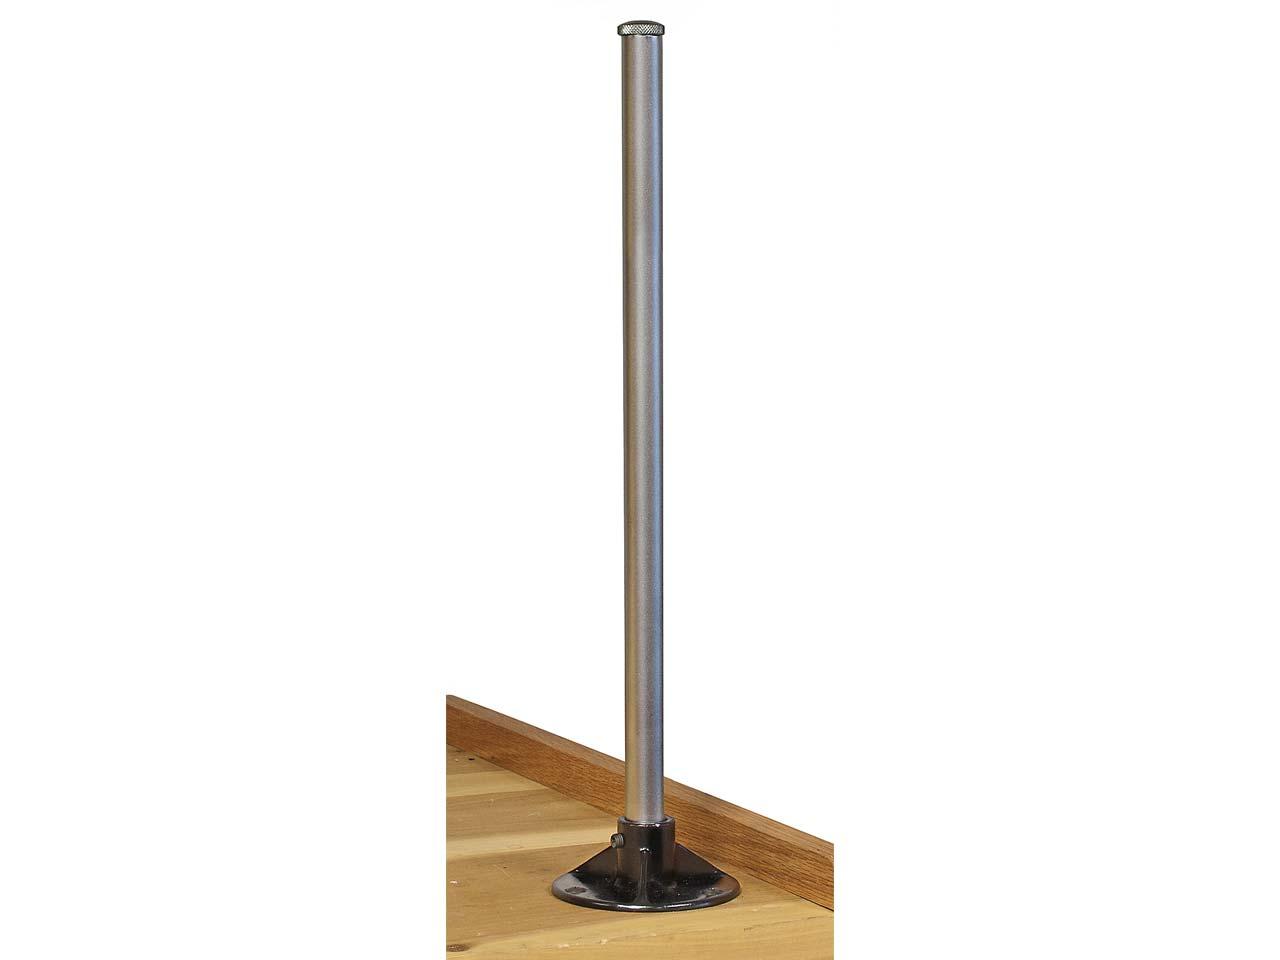 Genuine-US-Foredom-Workbench-Accessories-System miniatura 20